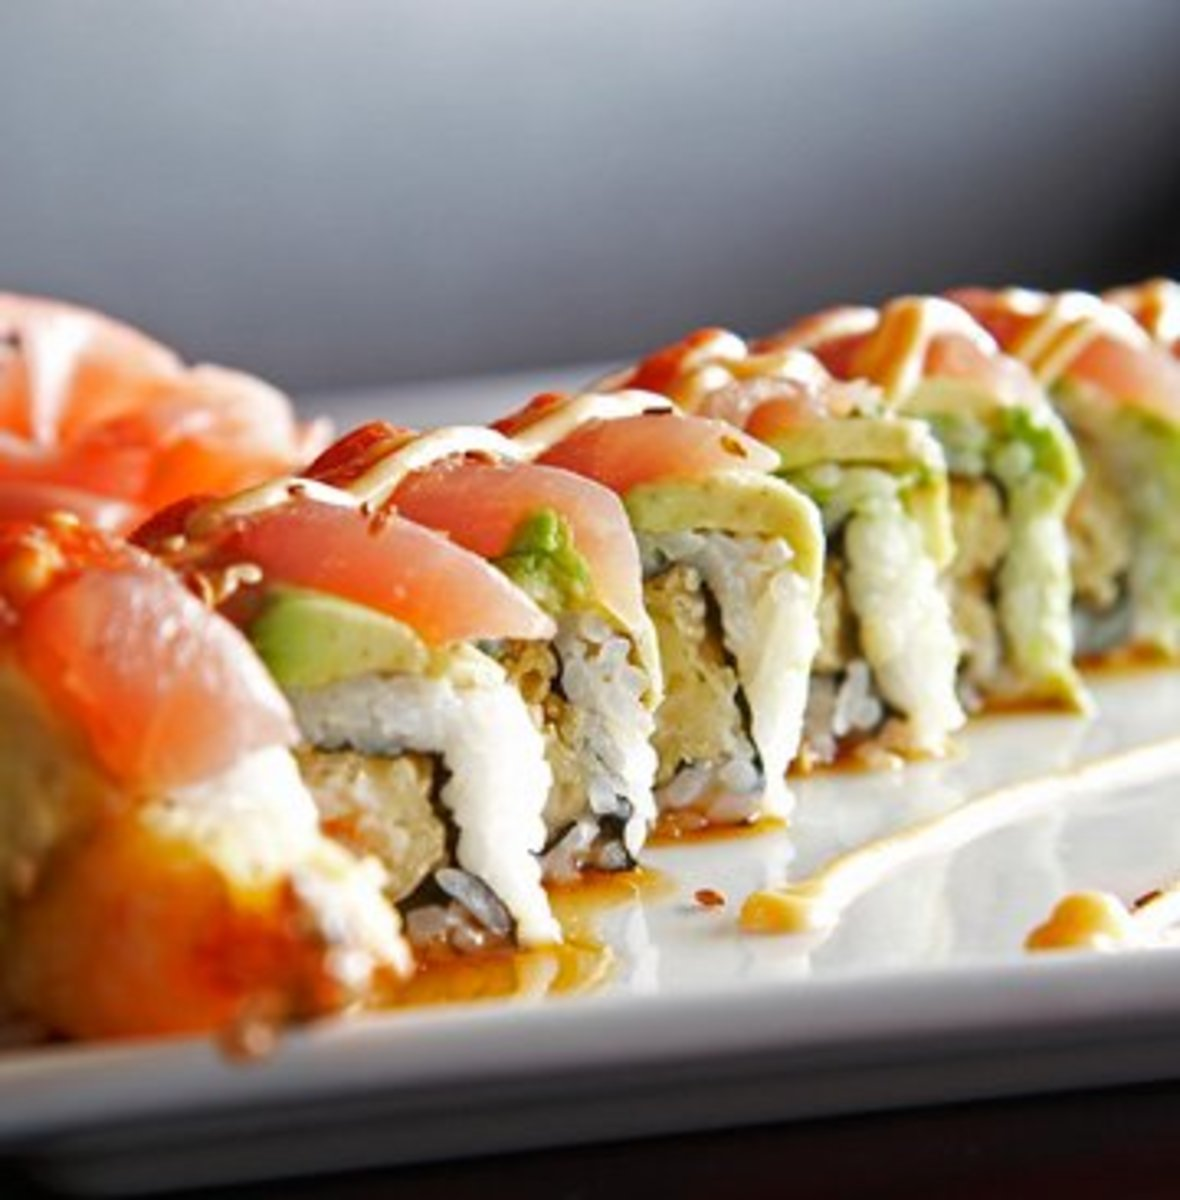 Longhorn Roll from Rock & Roll Sushi